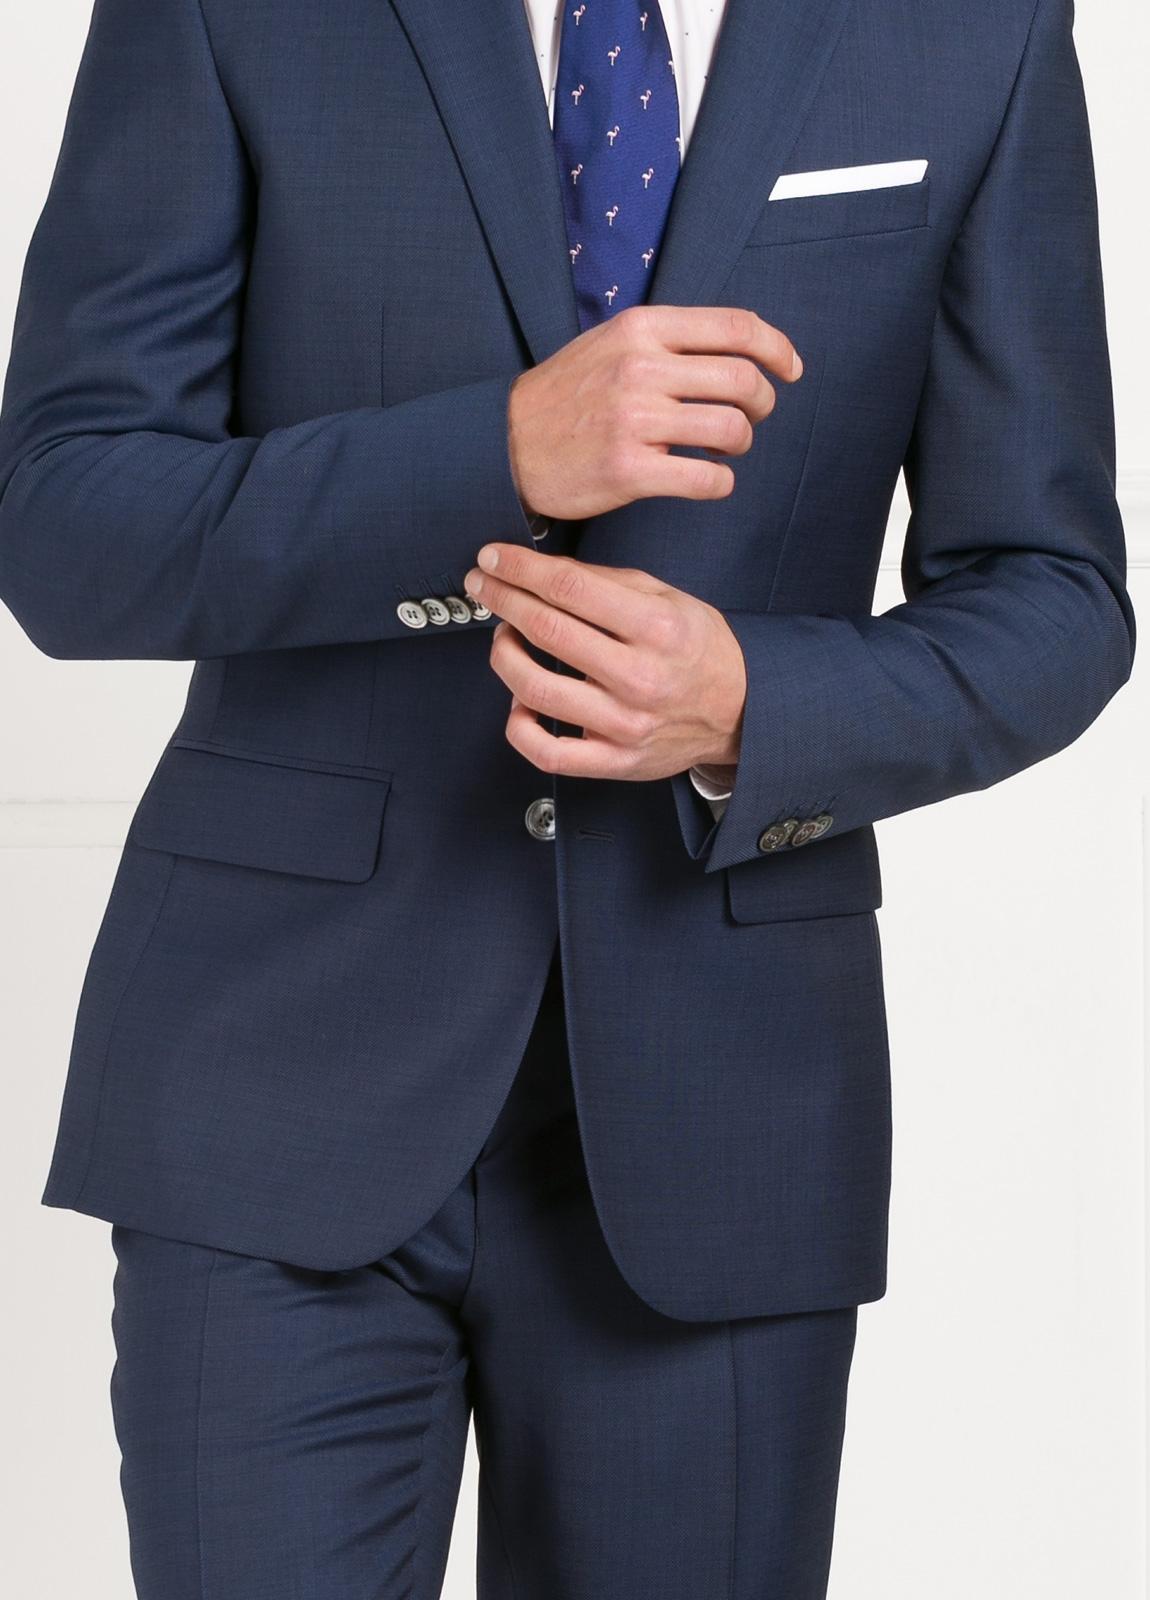 Traje liso SLIM FIT, tejido MARZOTTO, color azul, 100% Lana Virgen. - Ítem4